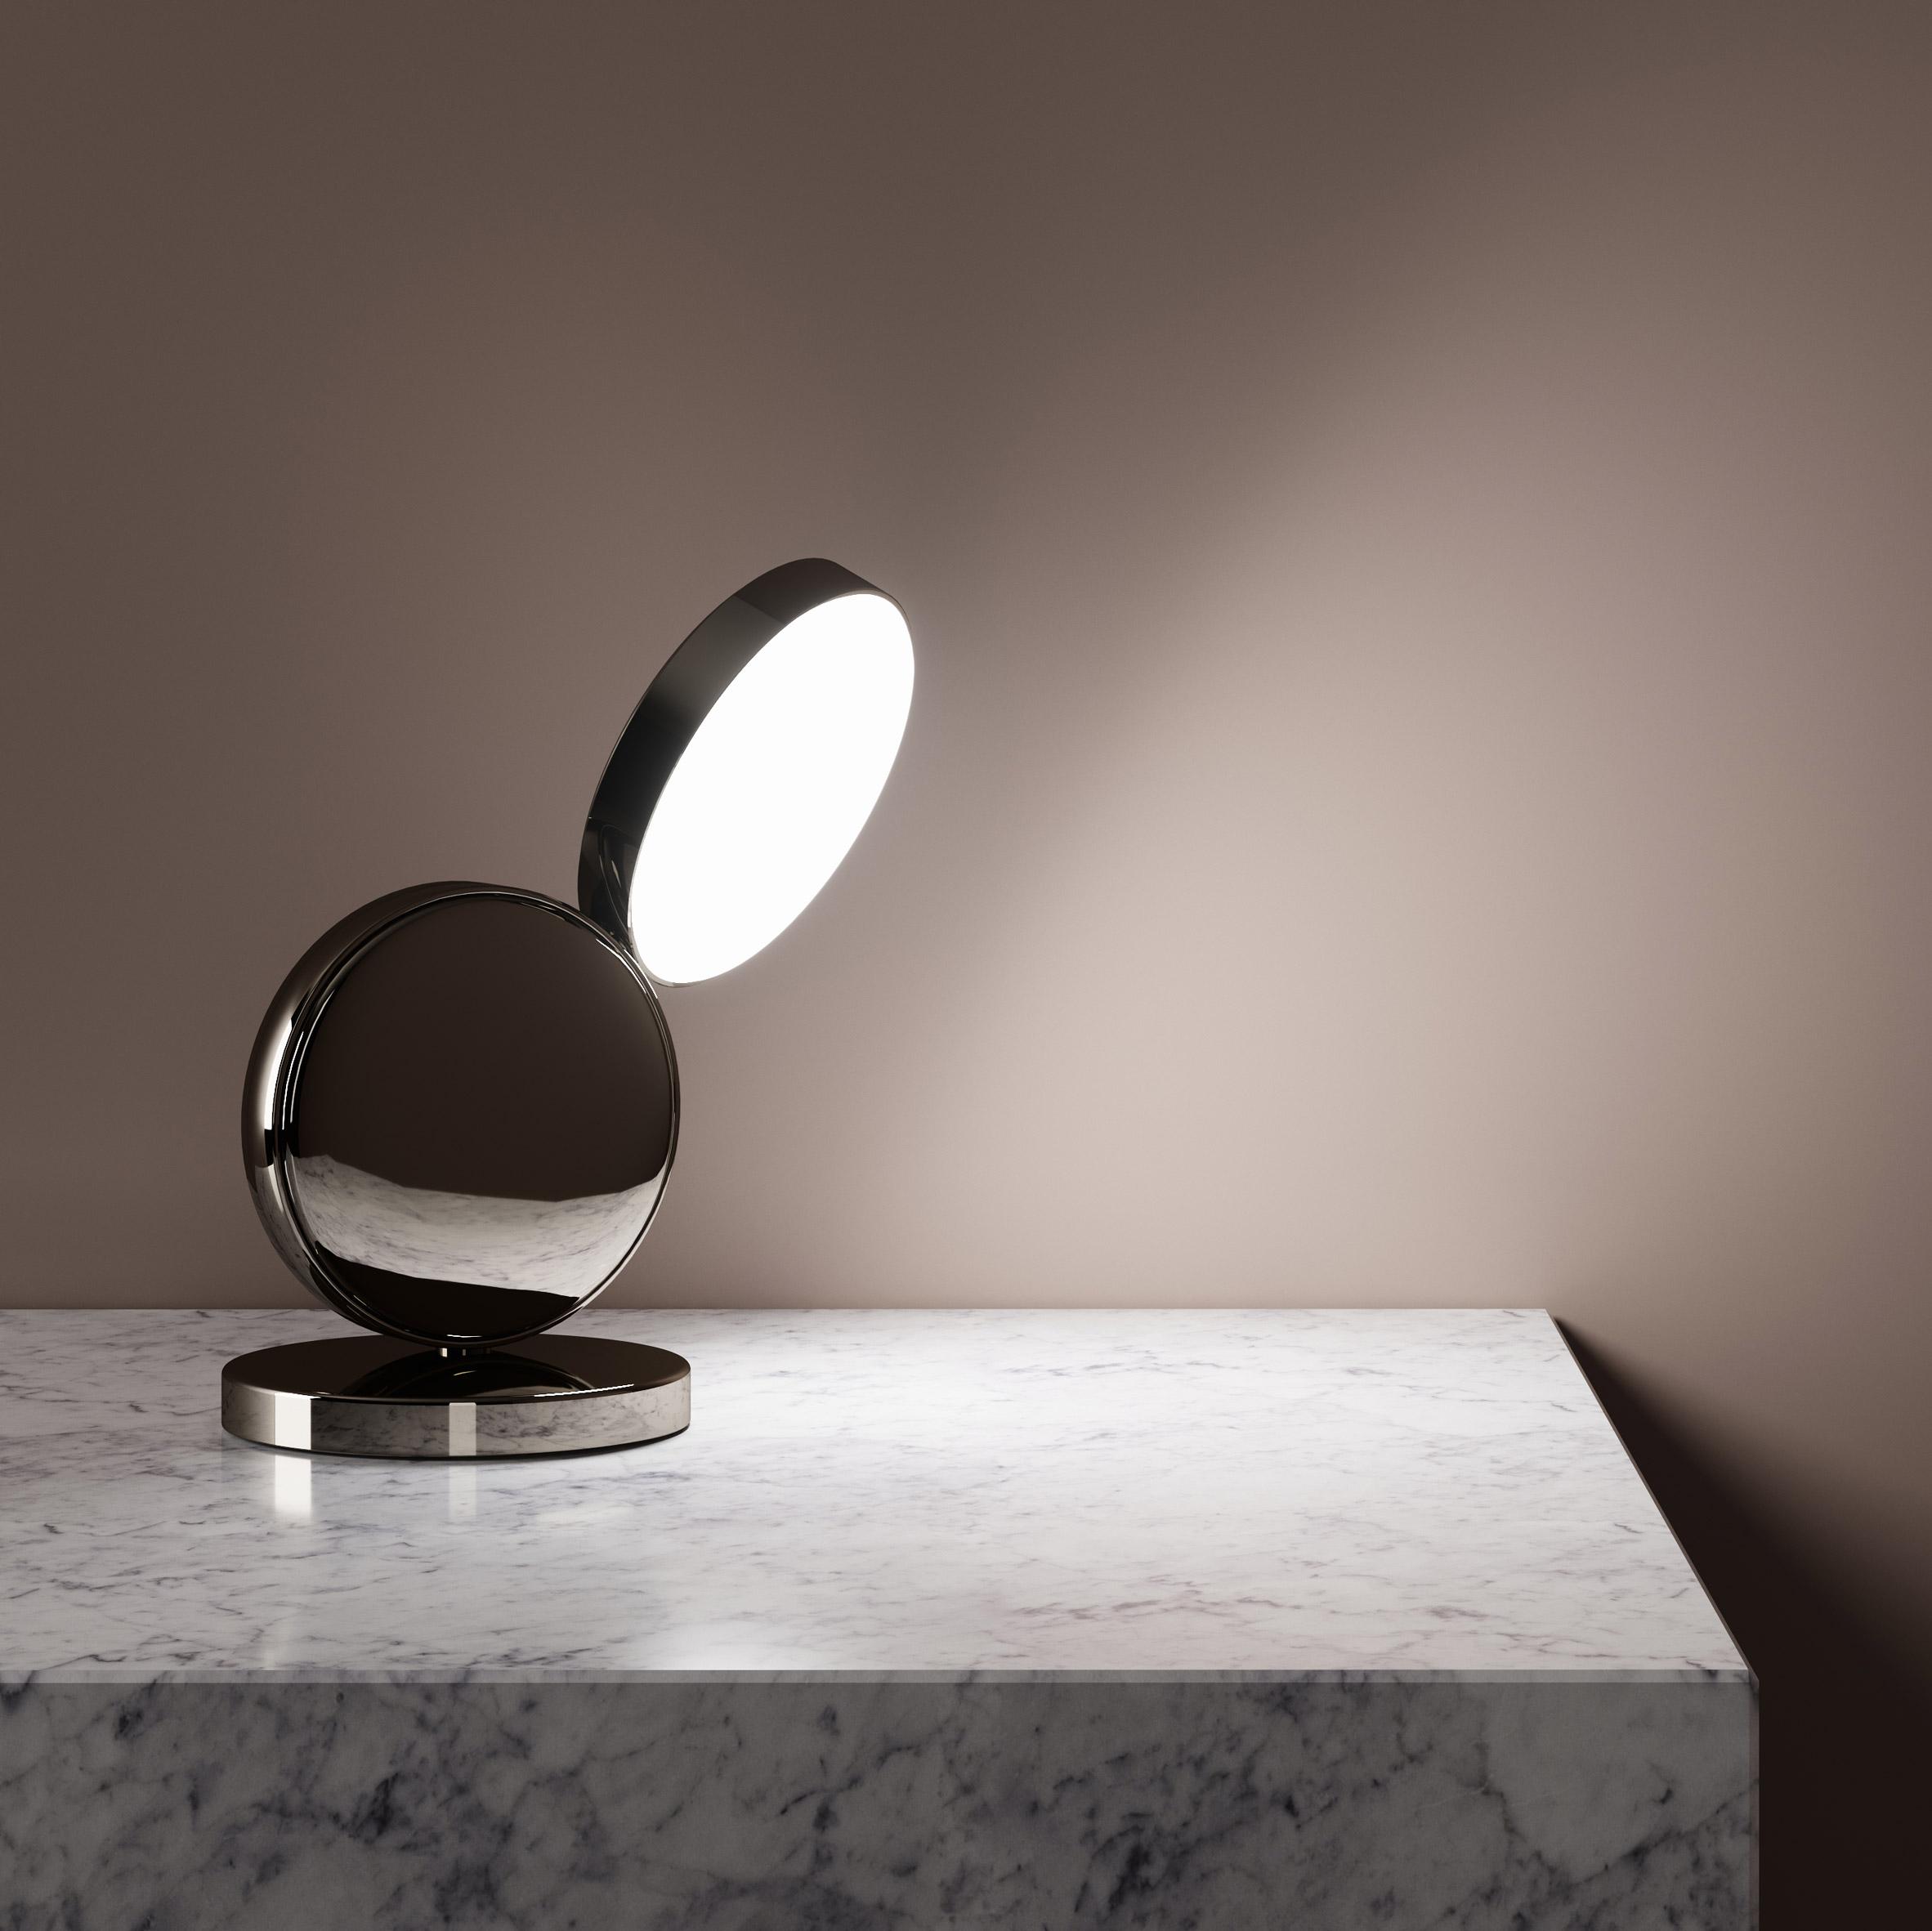 Claesson Koivisto Rune's Optunia lights at Milan design week